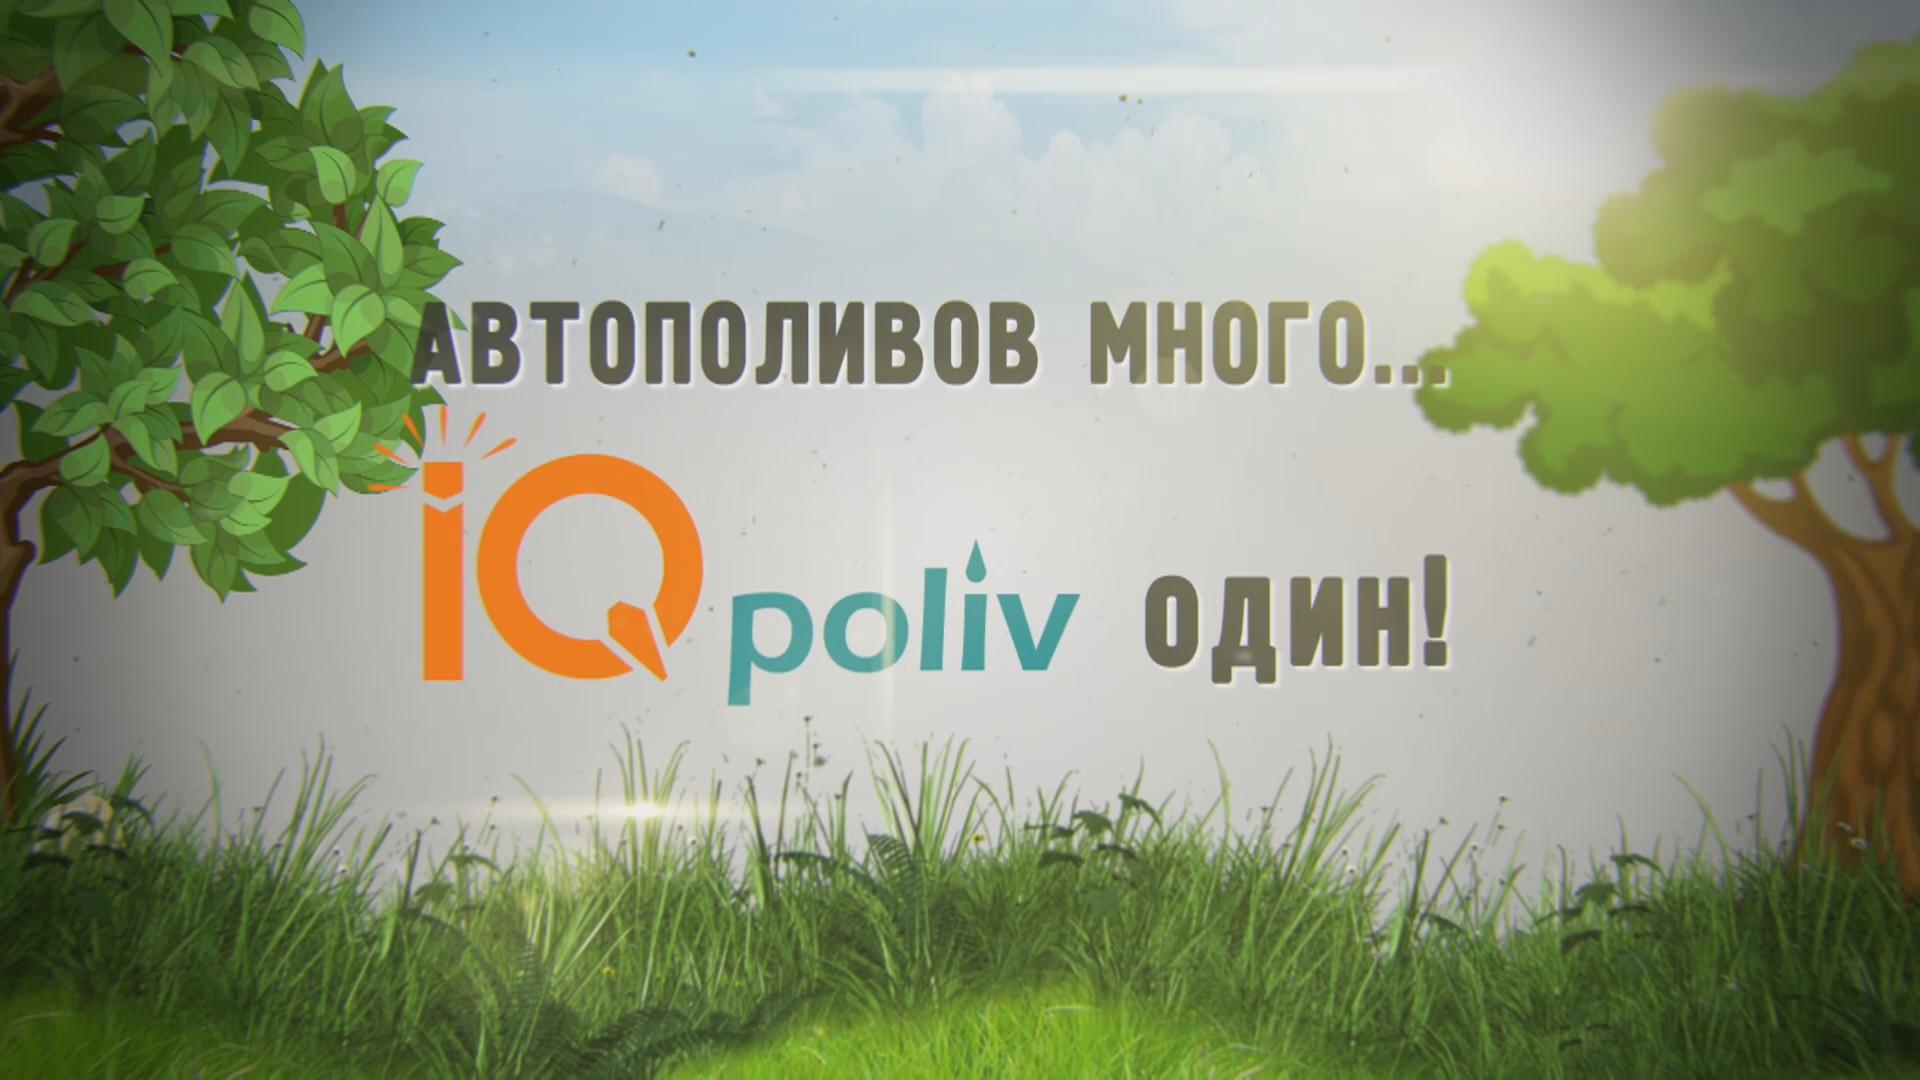 Интро с нуля для компании IQpoliv